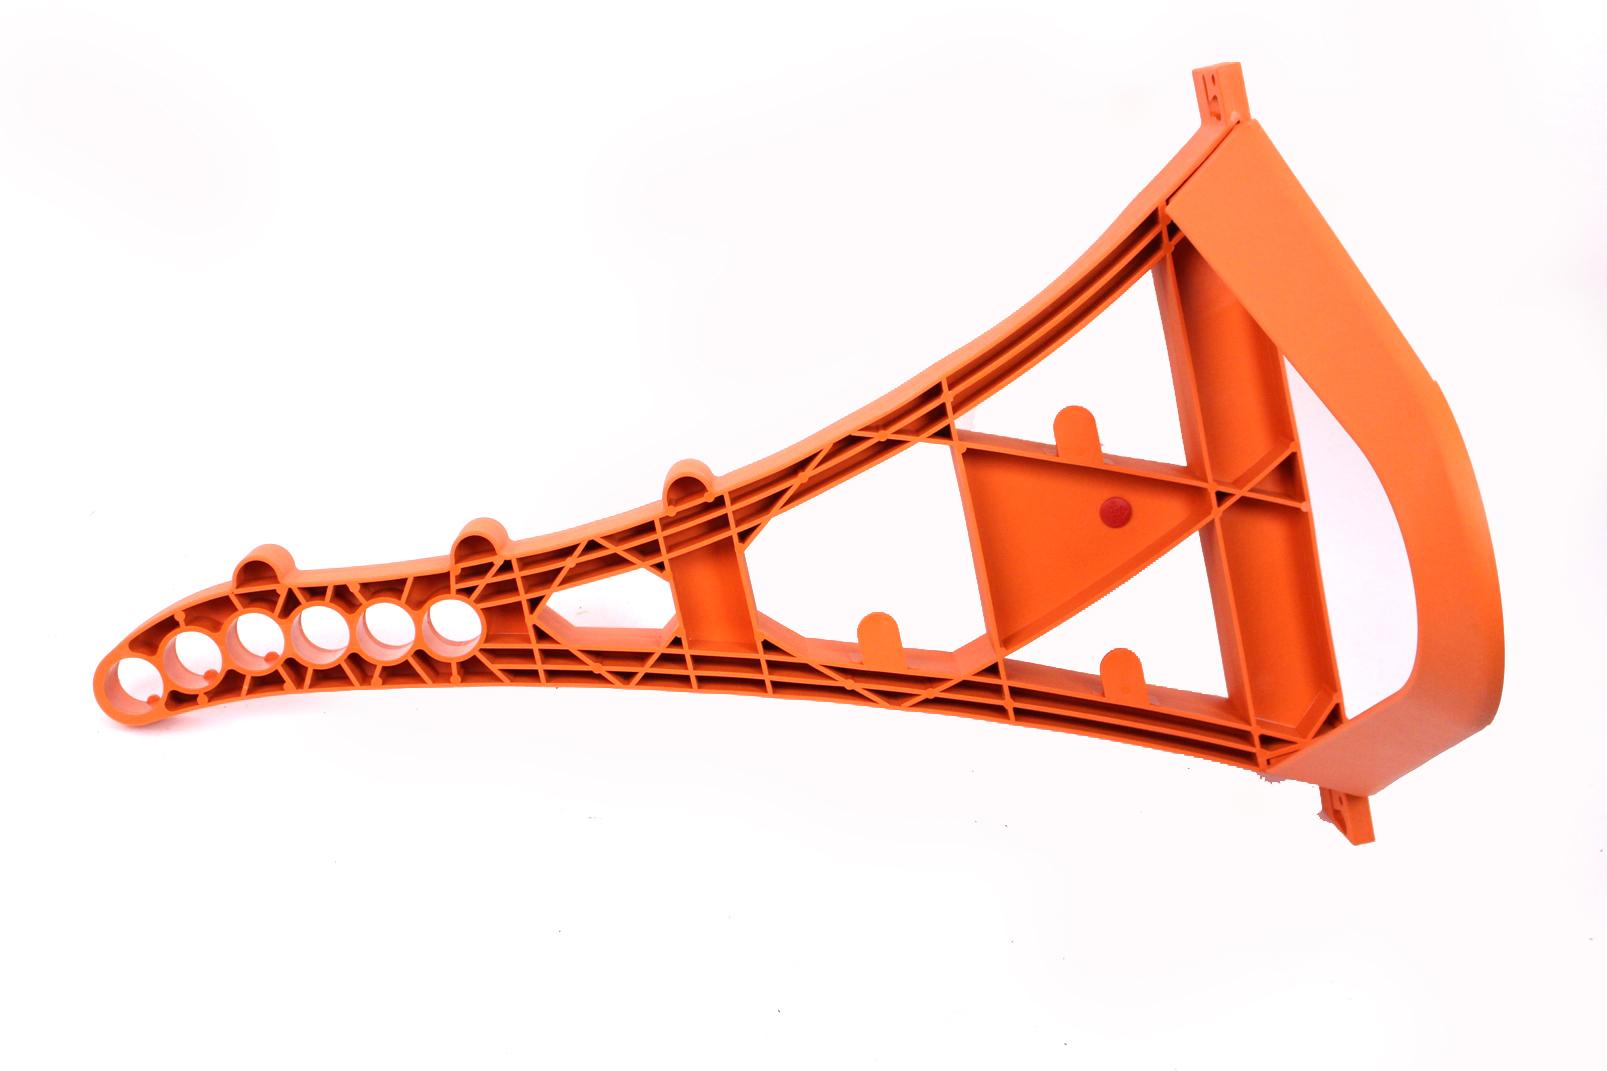 HEBIE Turrix Universal-Fahrradständer Bodenständer Wandhalter Fahrrad Ständer